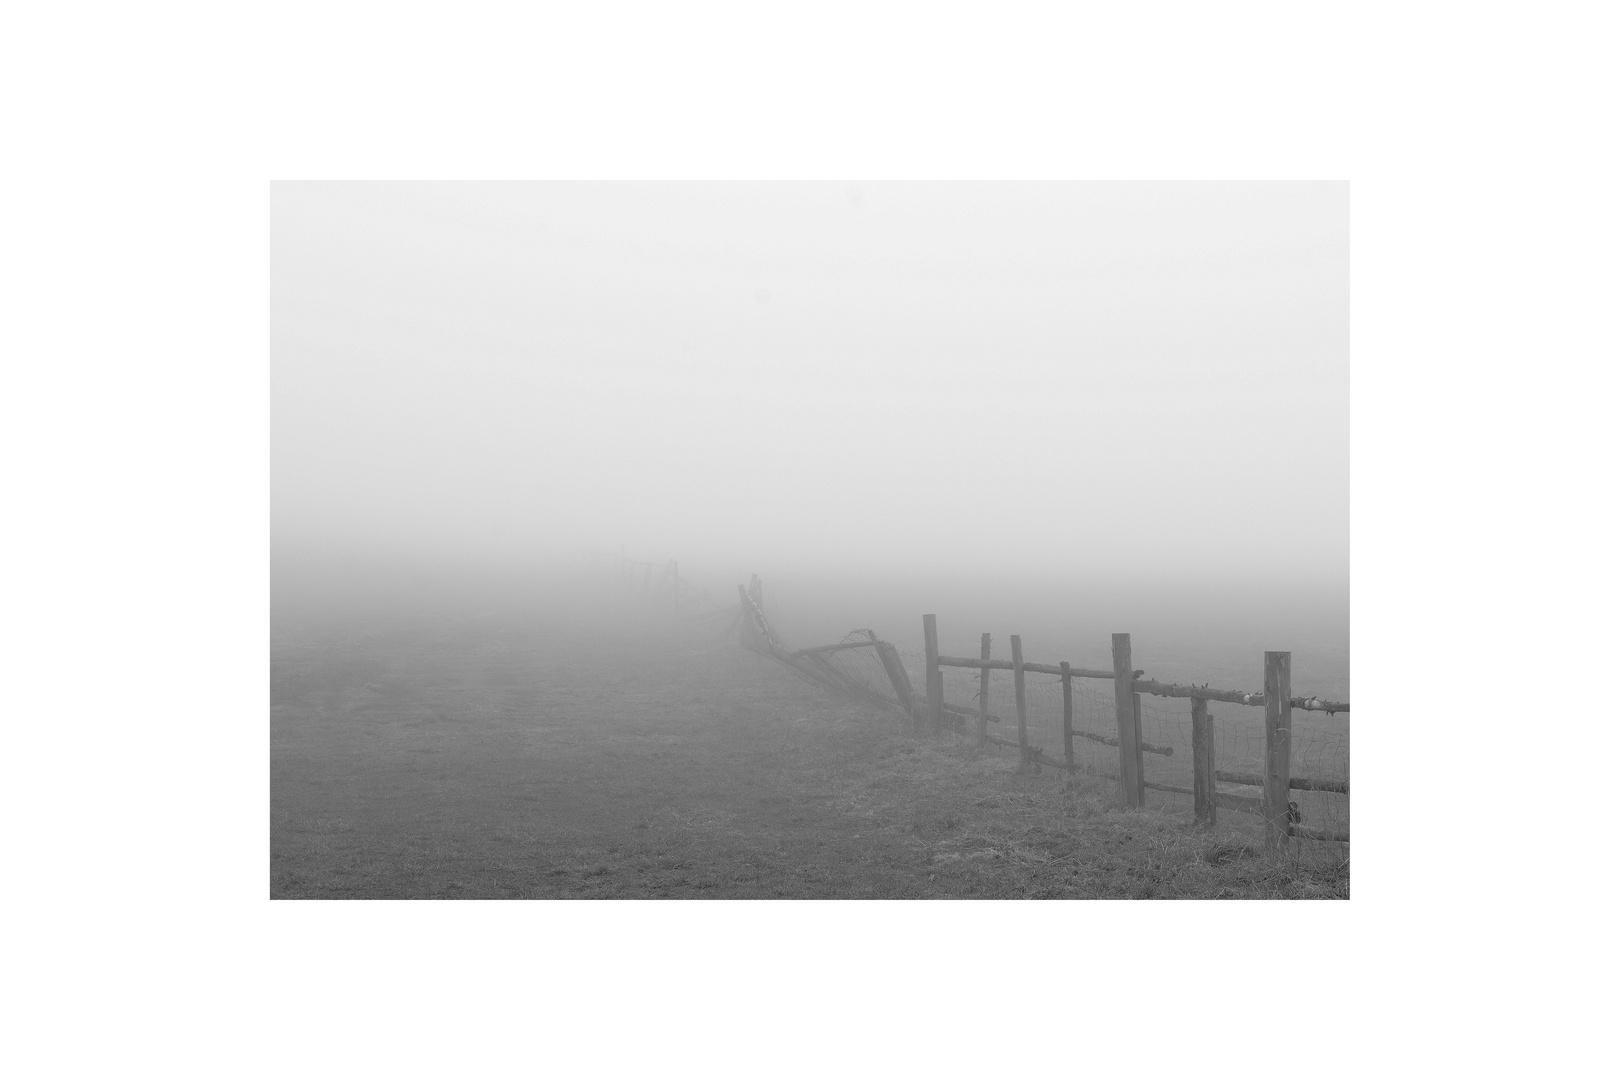 Nebelwerk